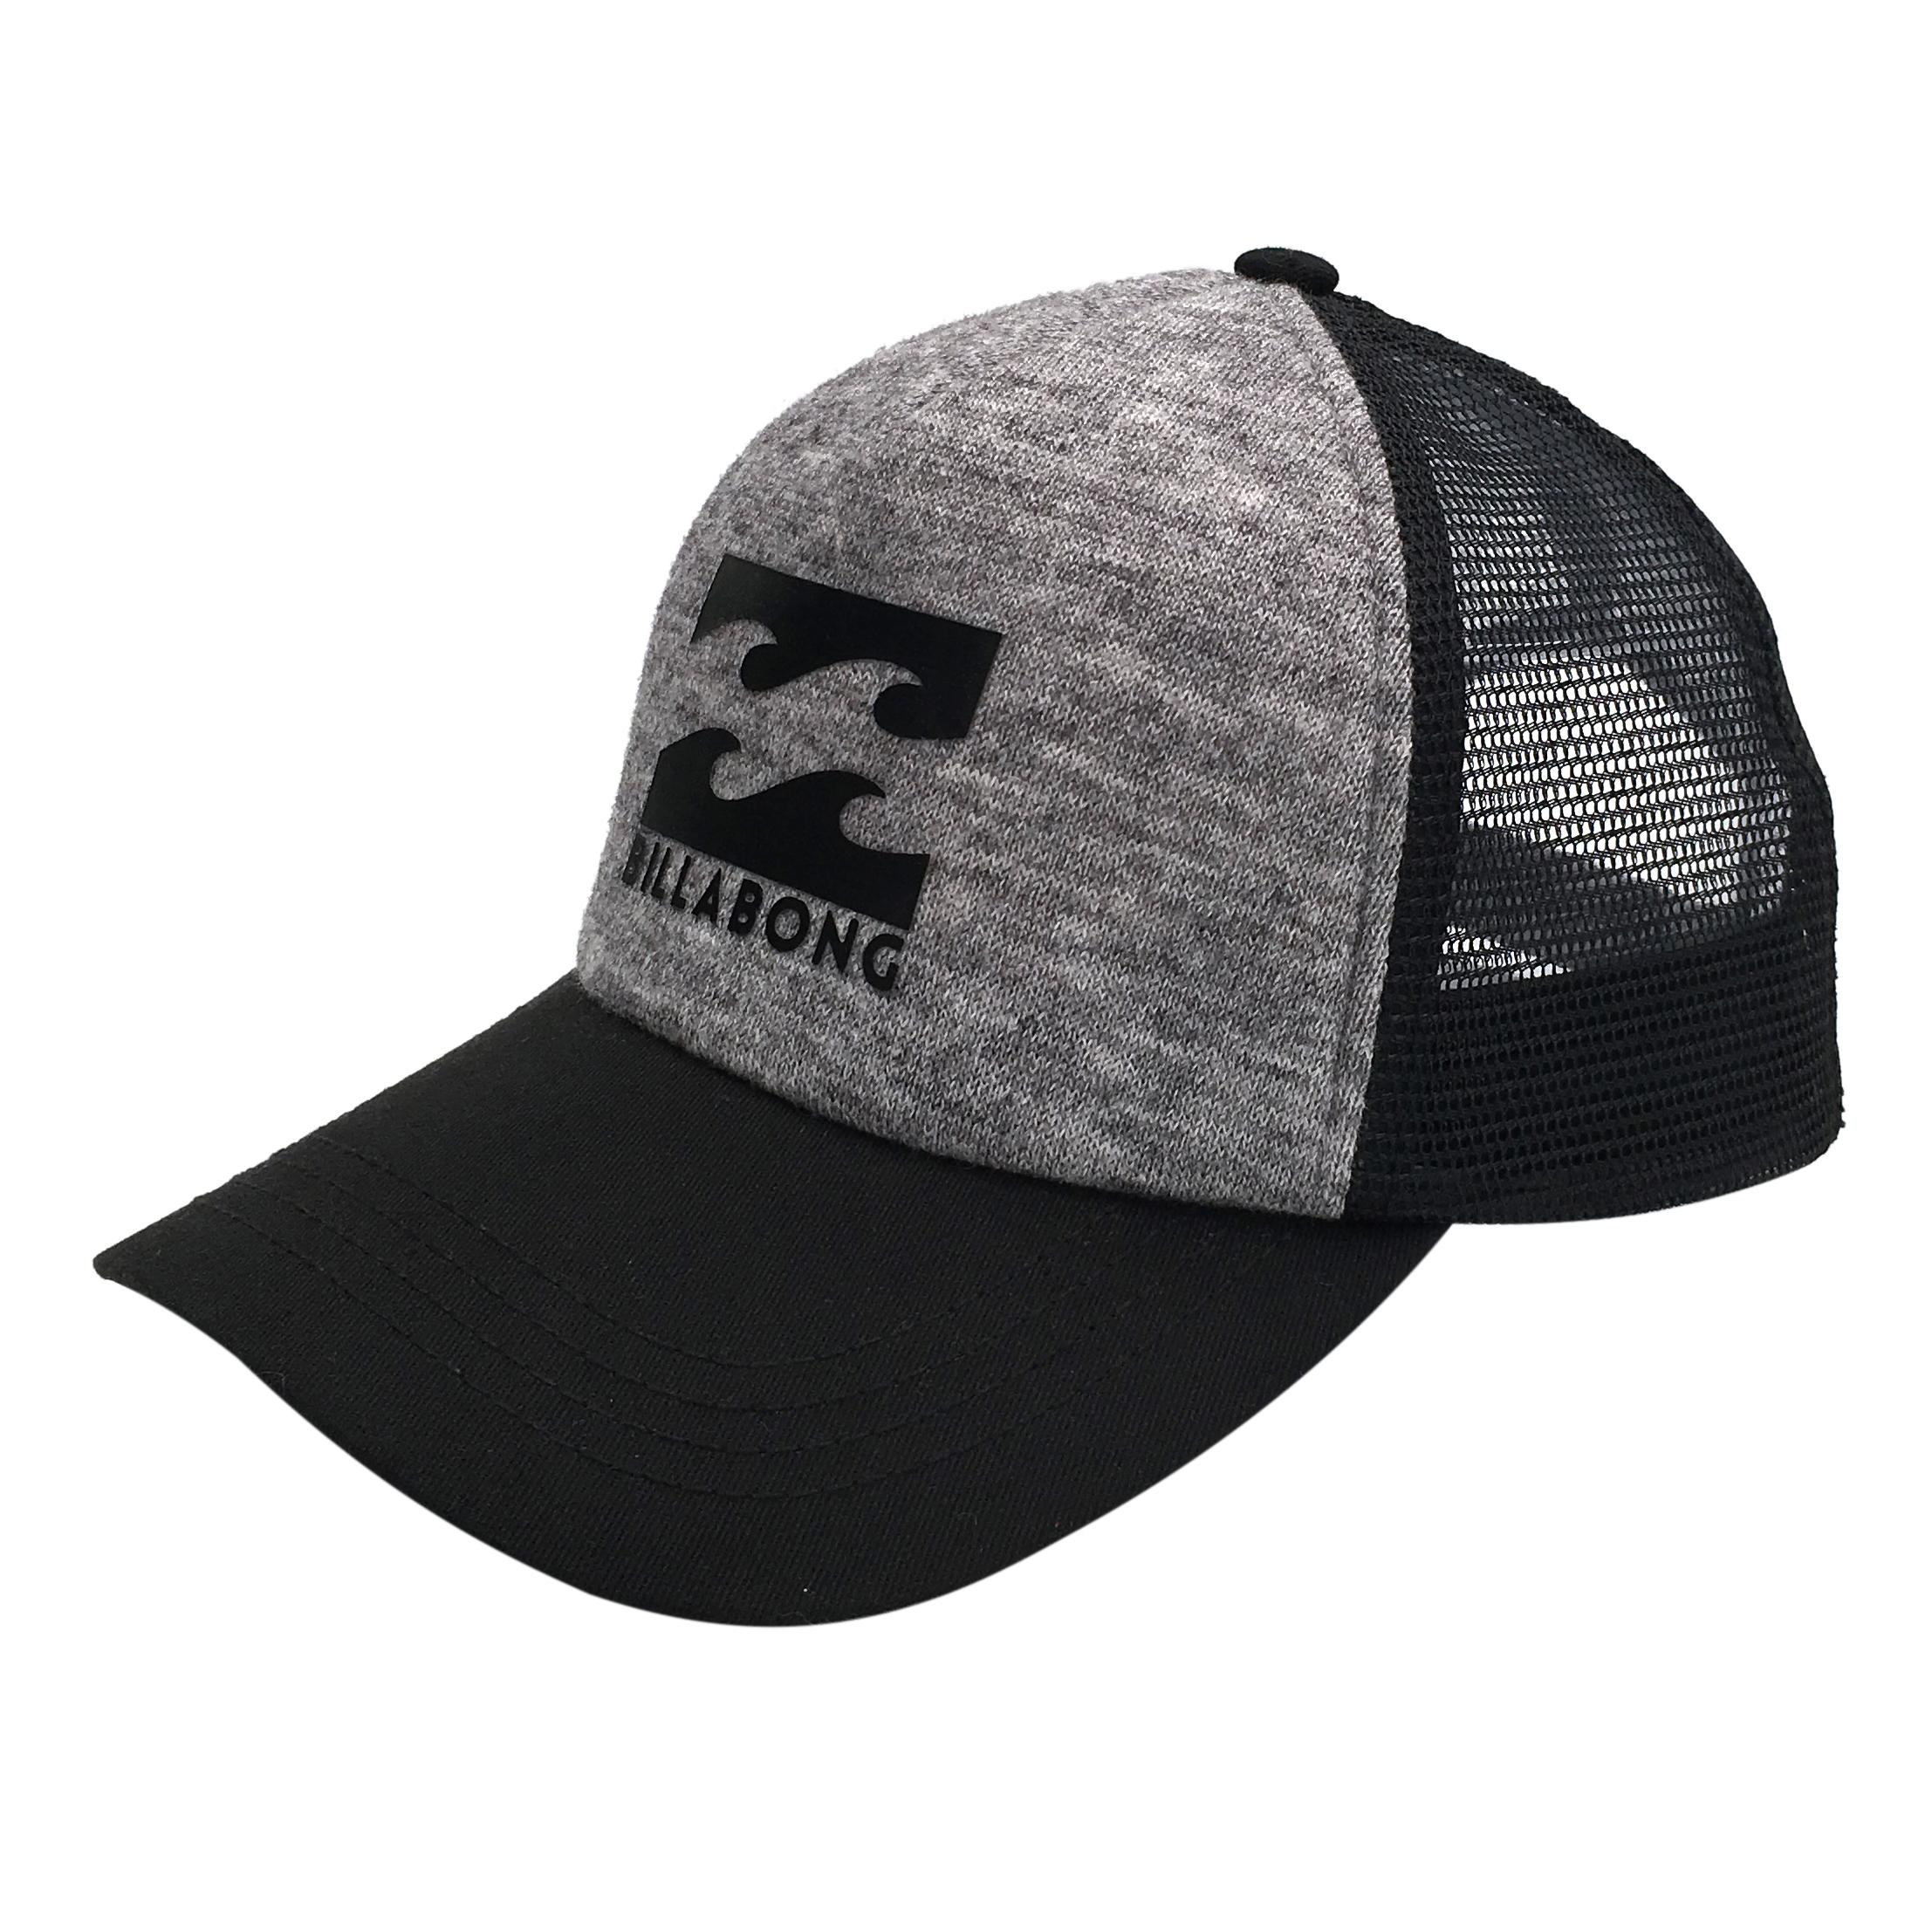 Customise Outdoor Fashion Design 5 Panel Trucker Hat